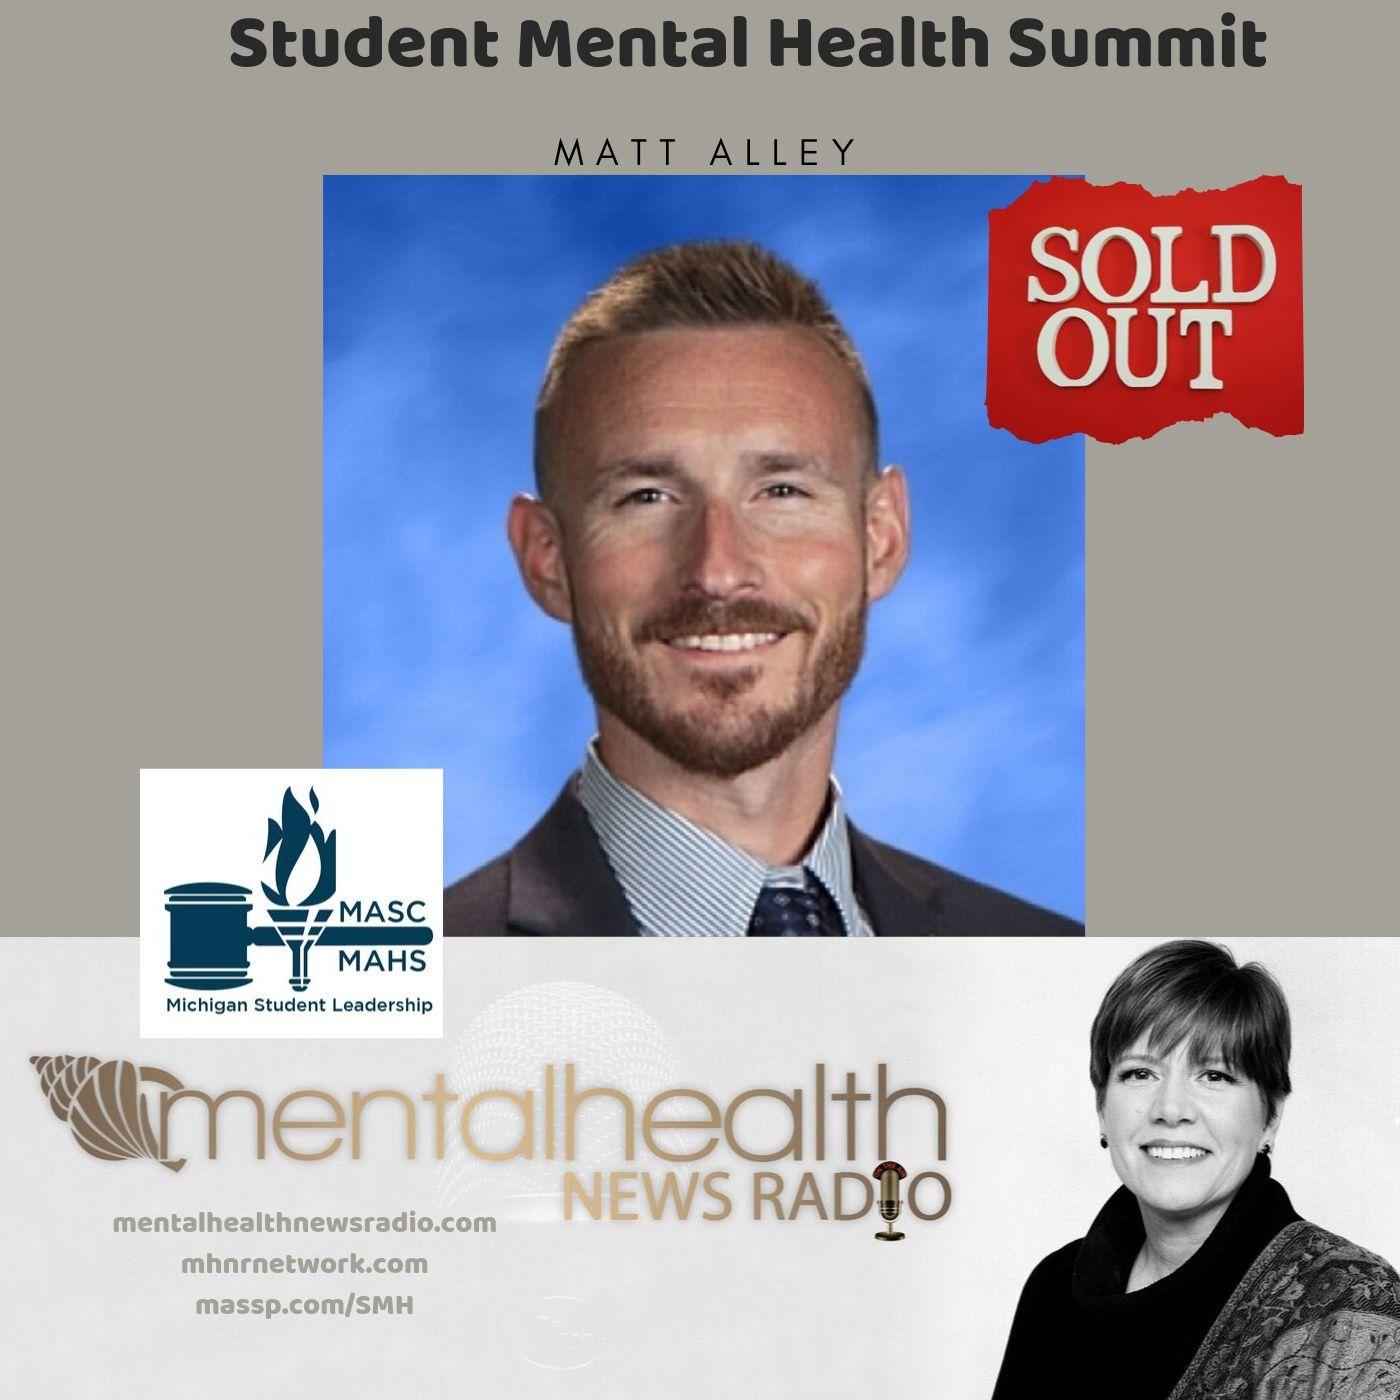 Mental Health News Radio - Student Mental Health Summit with Matt Alley